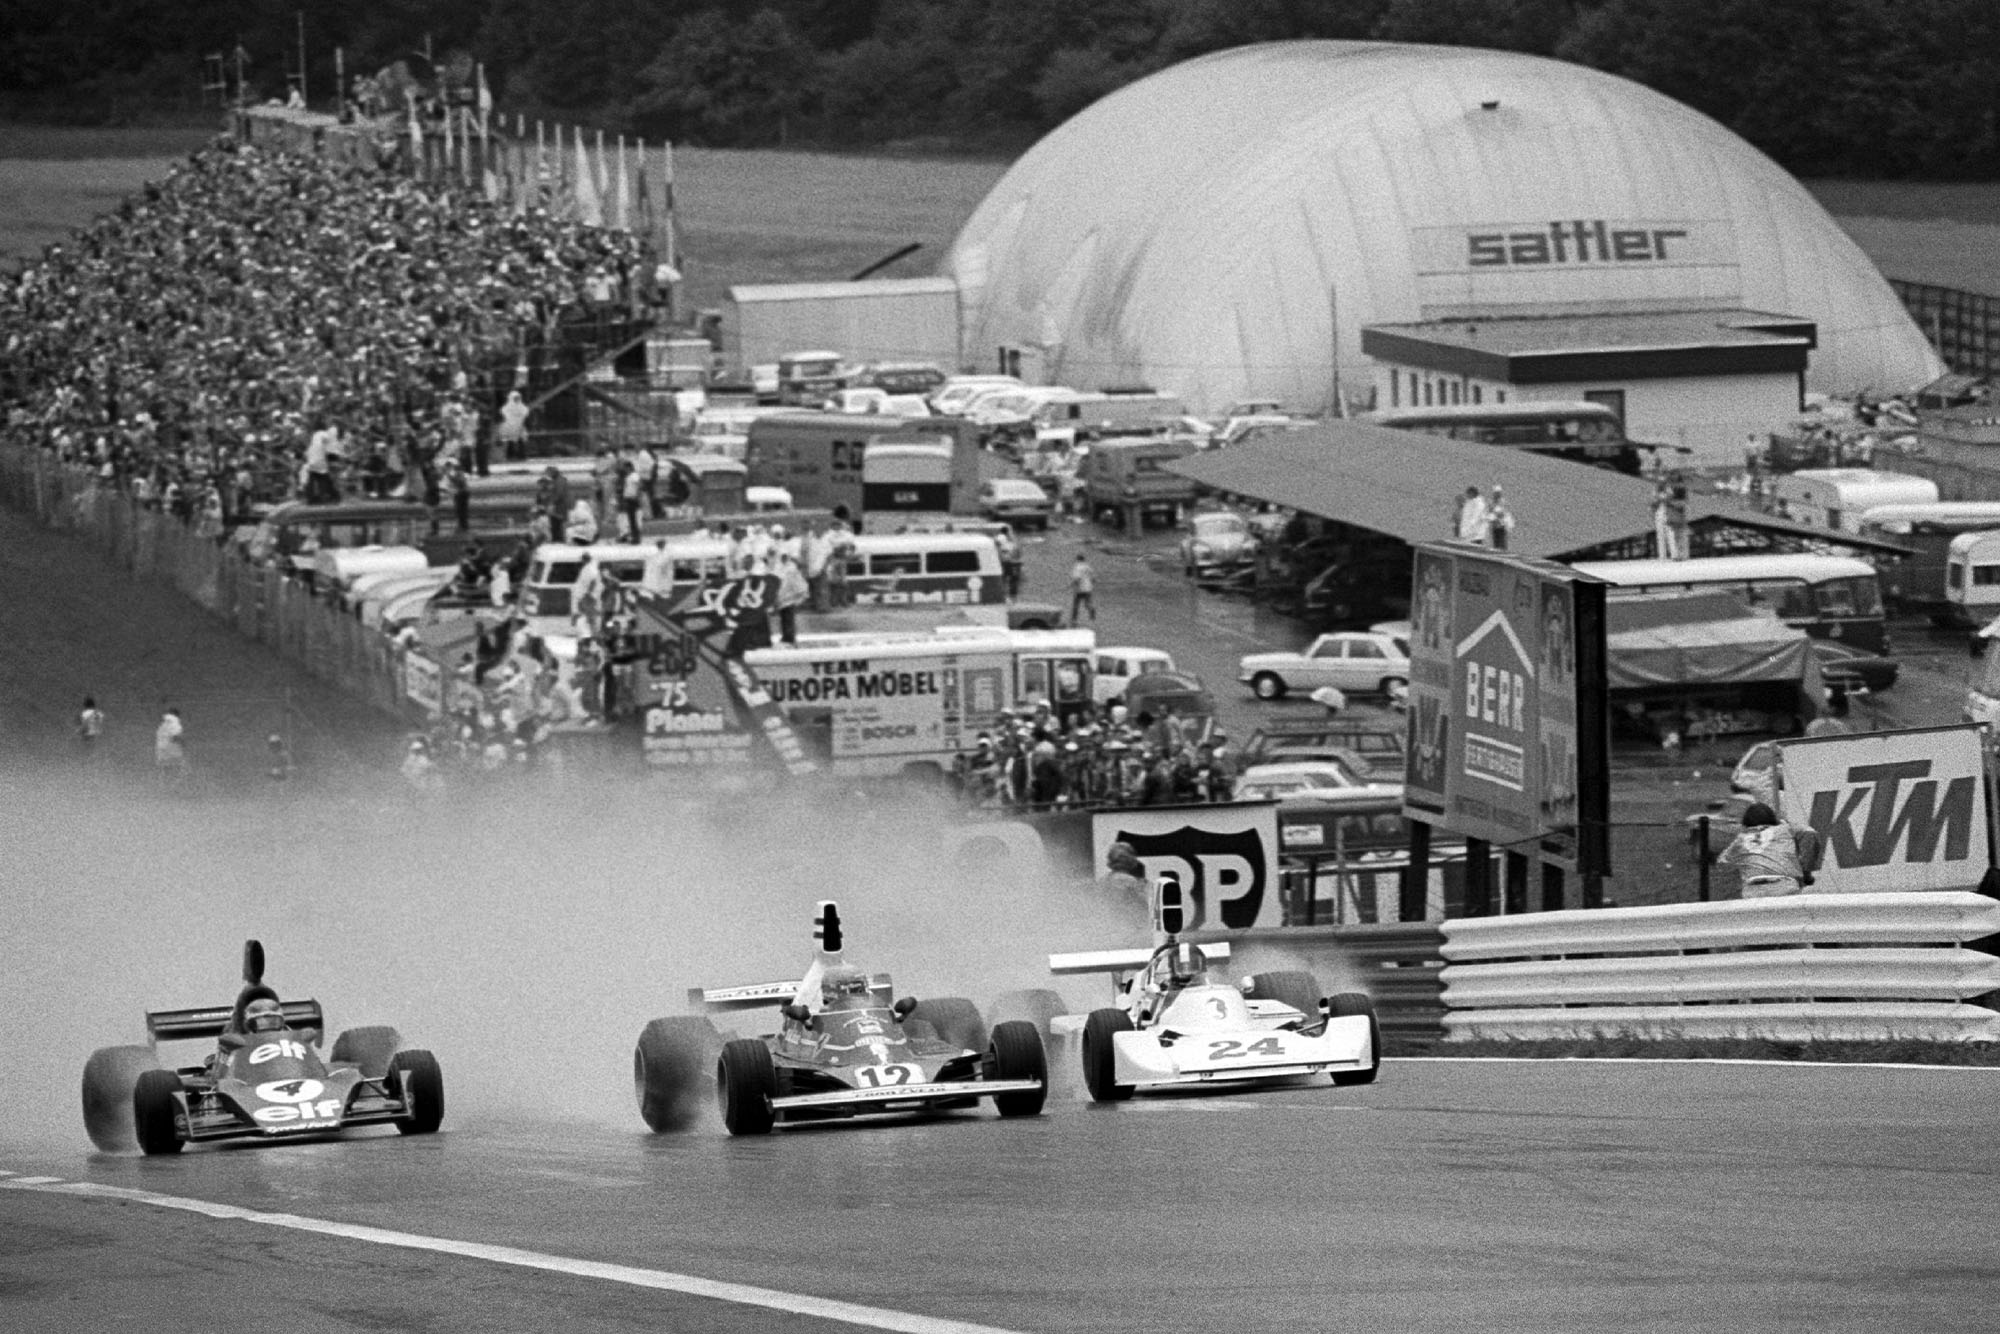 Niki Lauda (Ferrari) heads the pack into the first corner of the 1975 Austrian Grand Prix, Osterreichring.